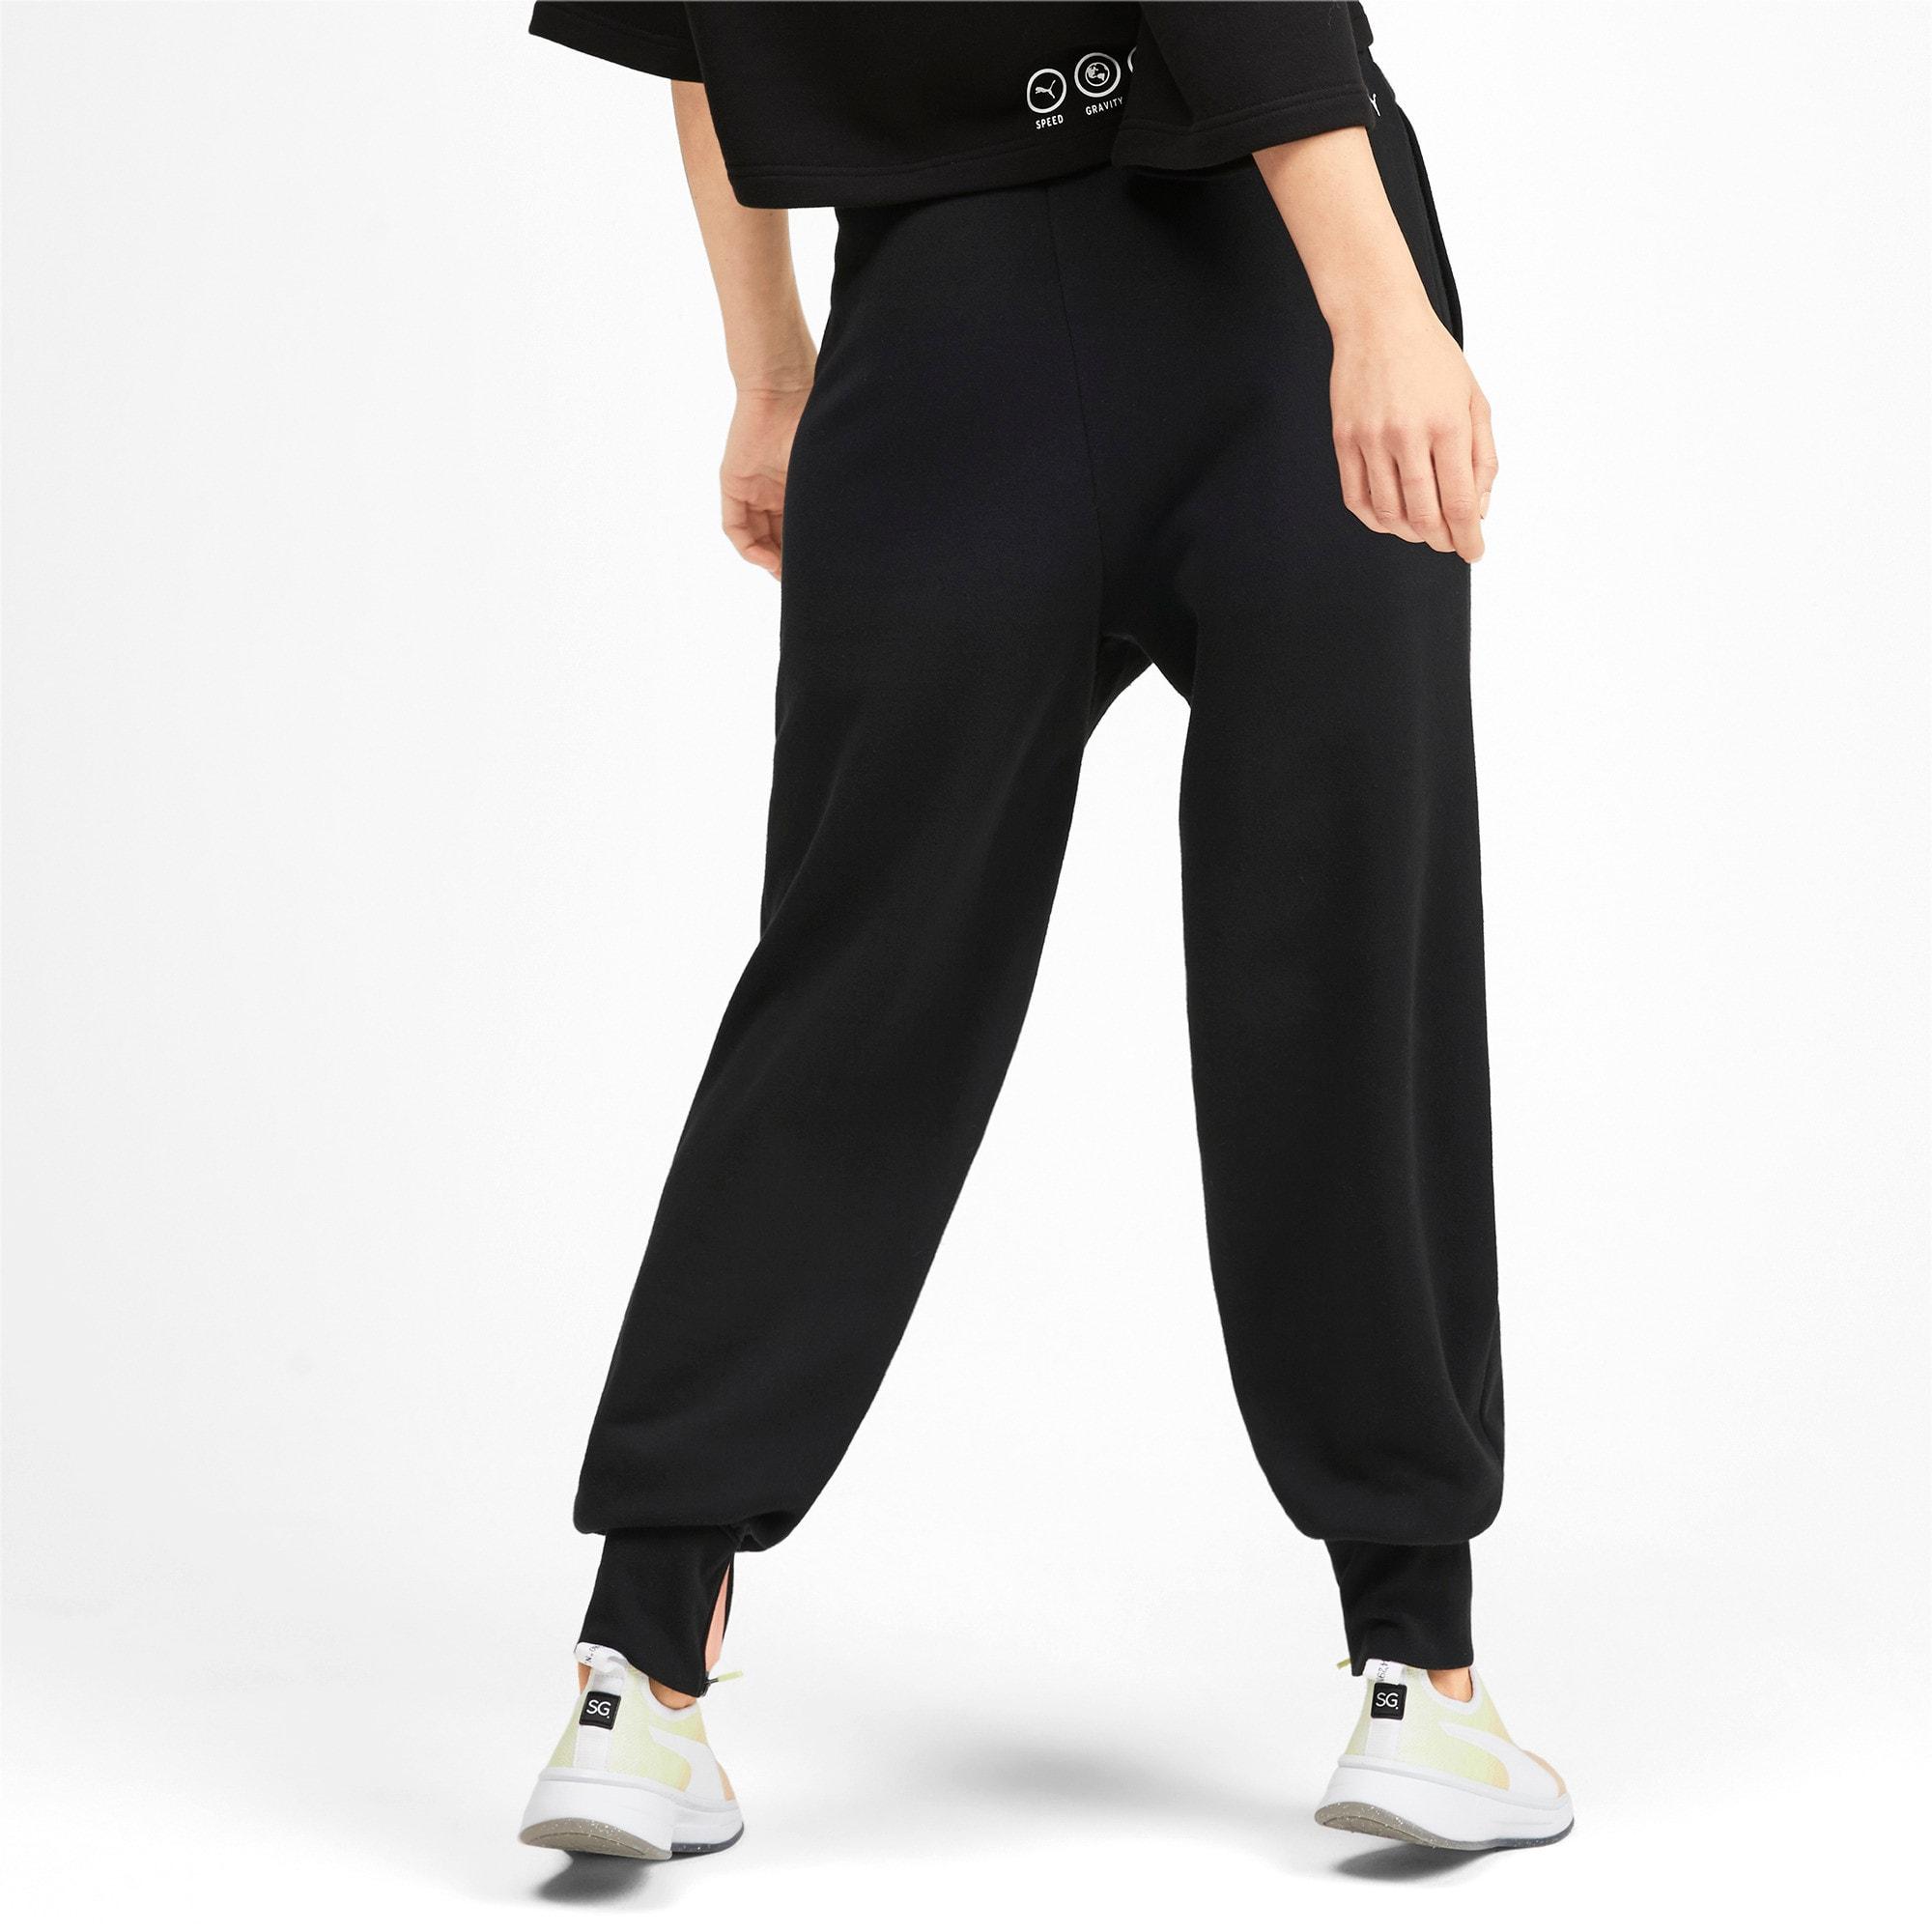 Thumbnail 2 of PUMA x SELENA GOMEZ Women's Sweatpants, Puma Black, medium